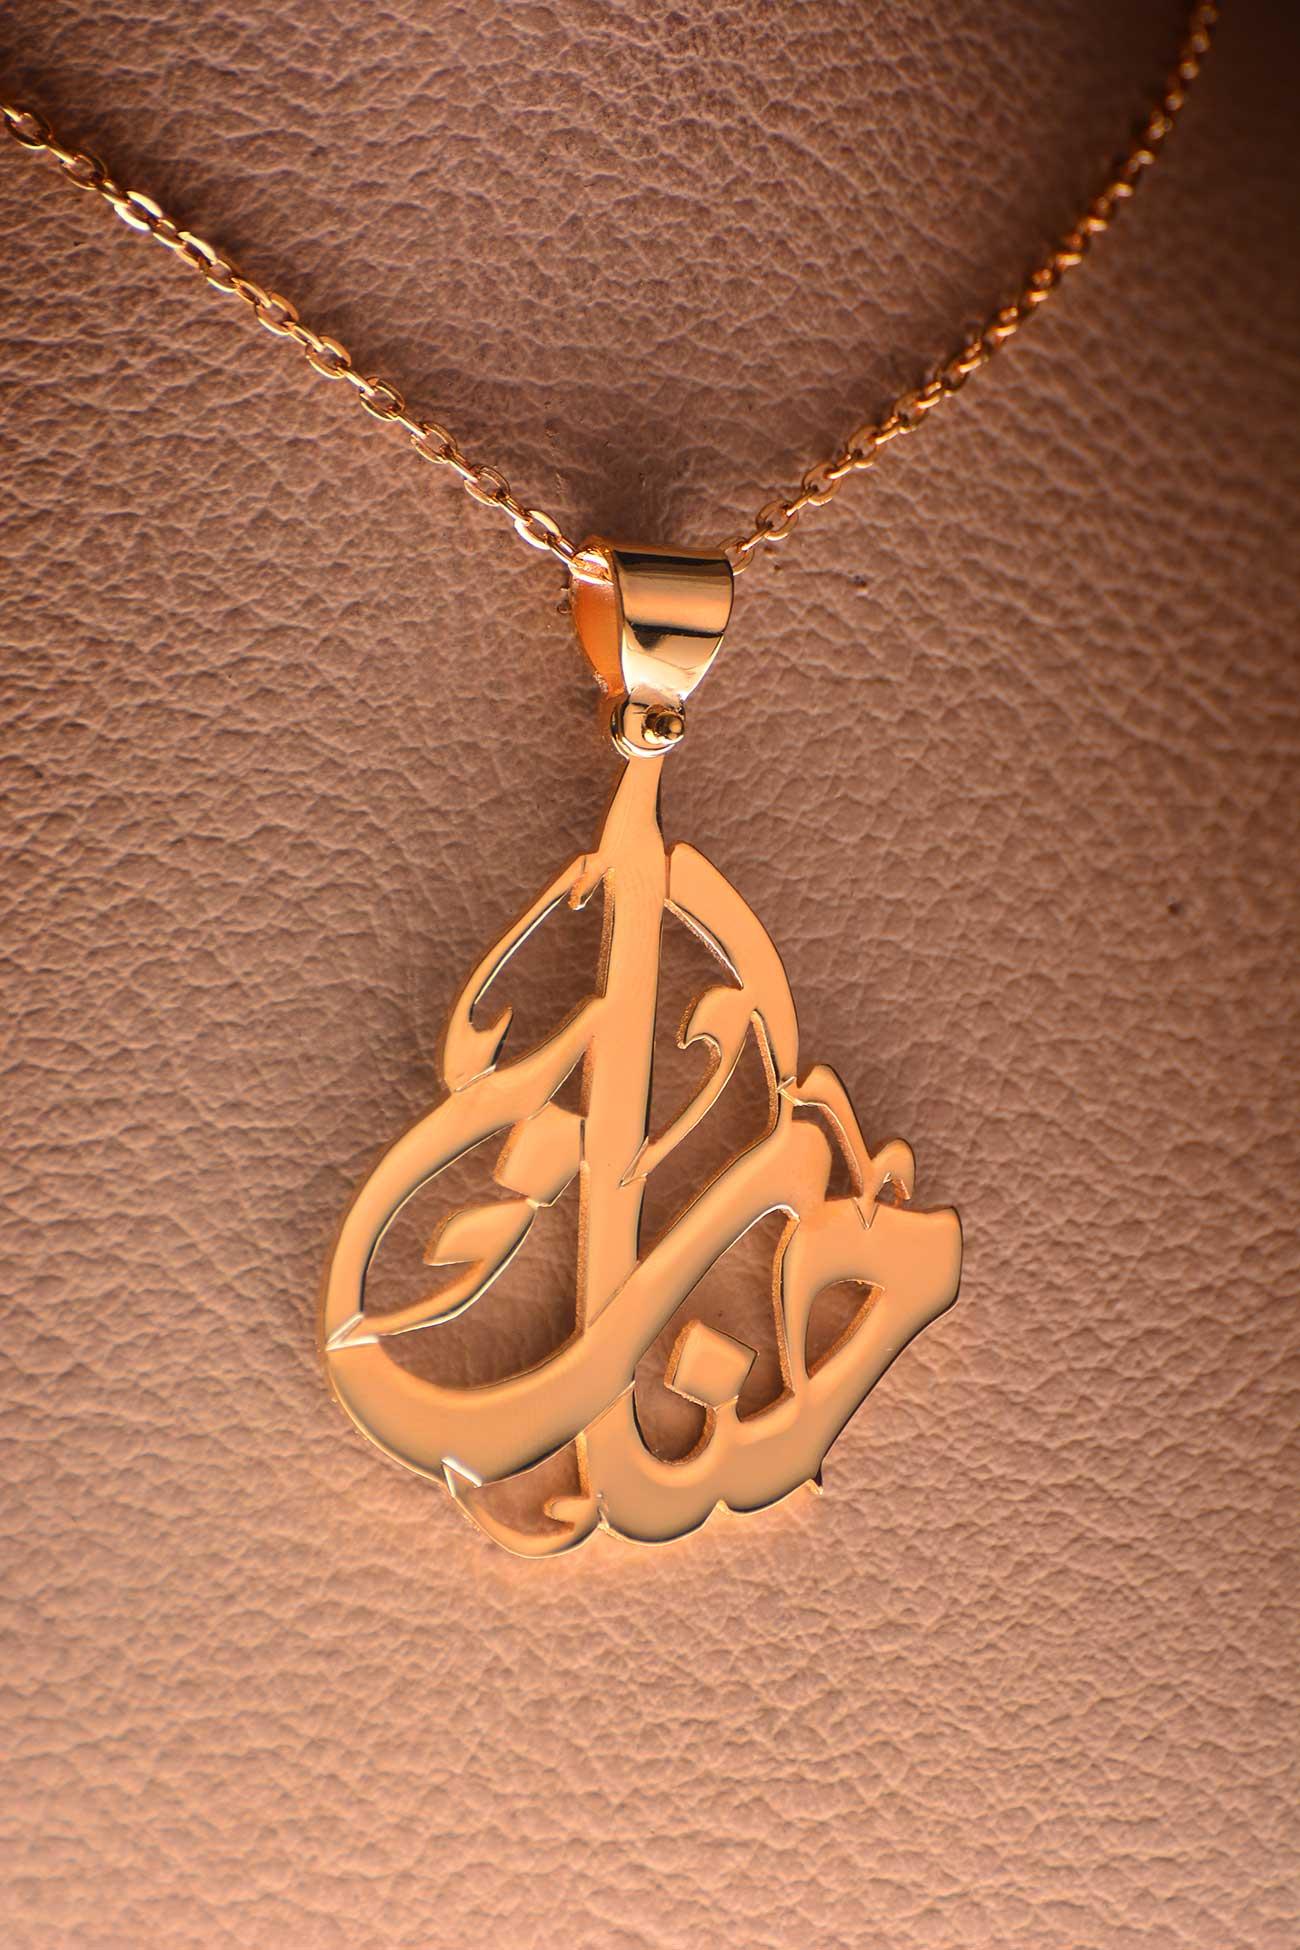 صور اسم حنان رمزيات وخلفيات مكتوب عليها Hanan ميكساتك